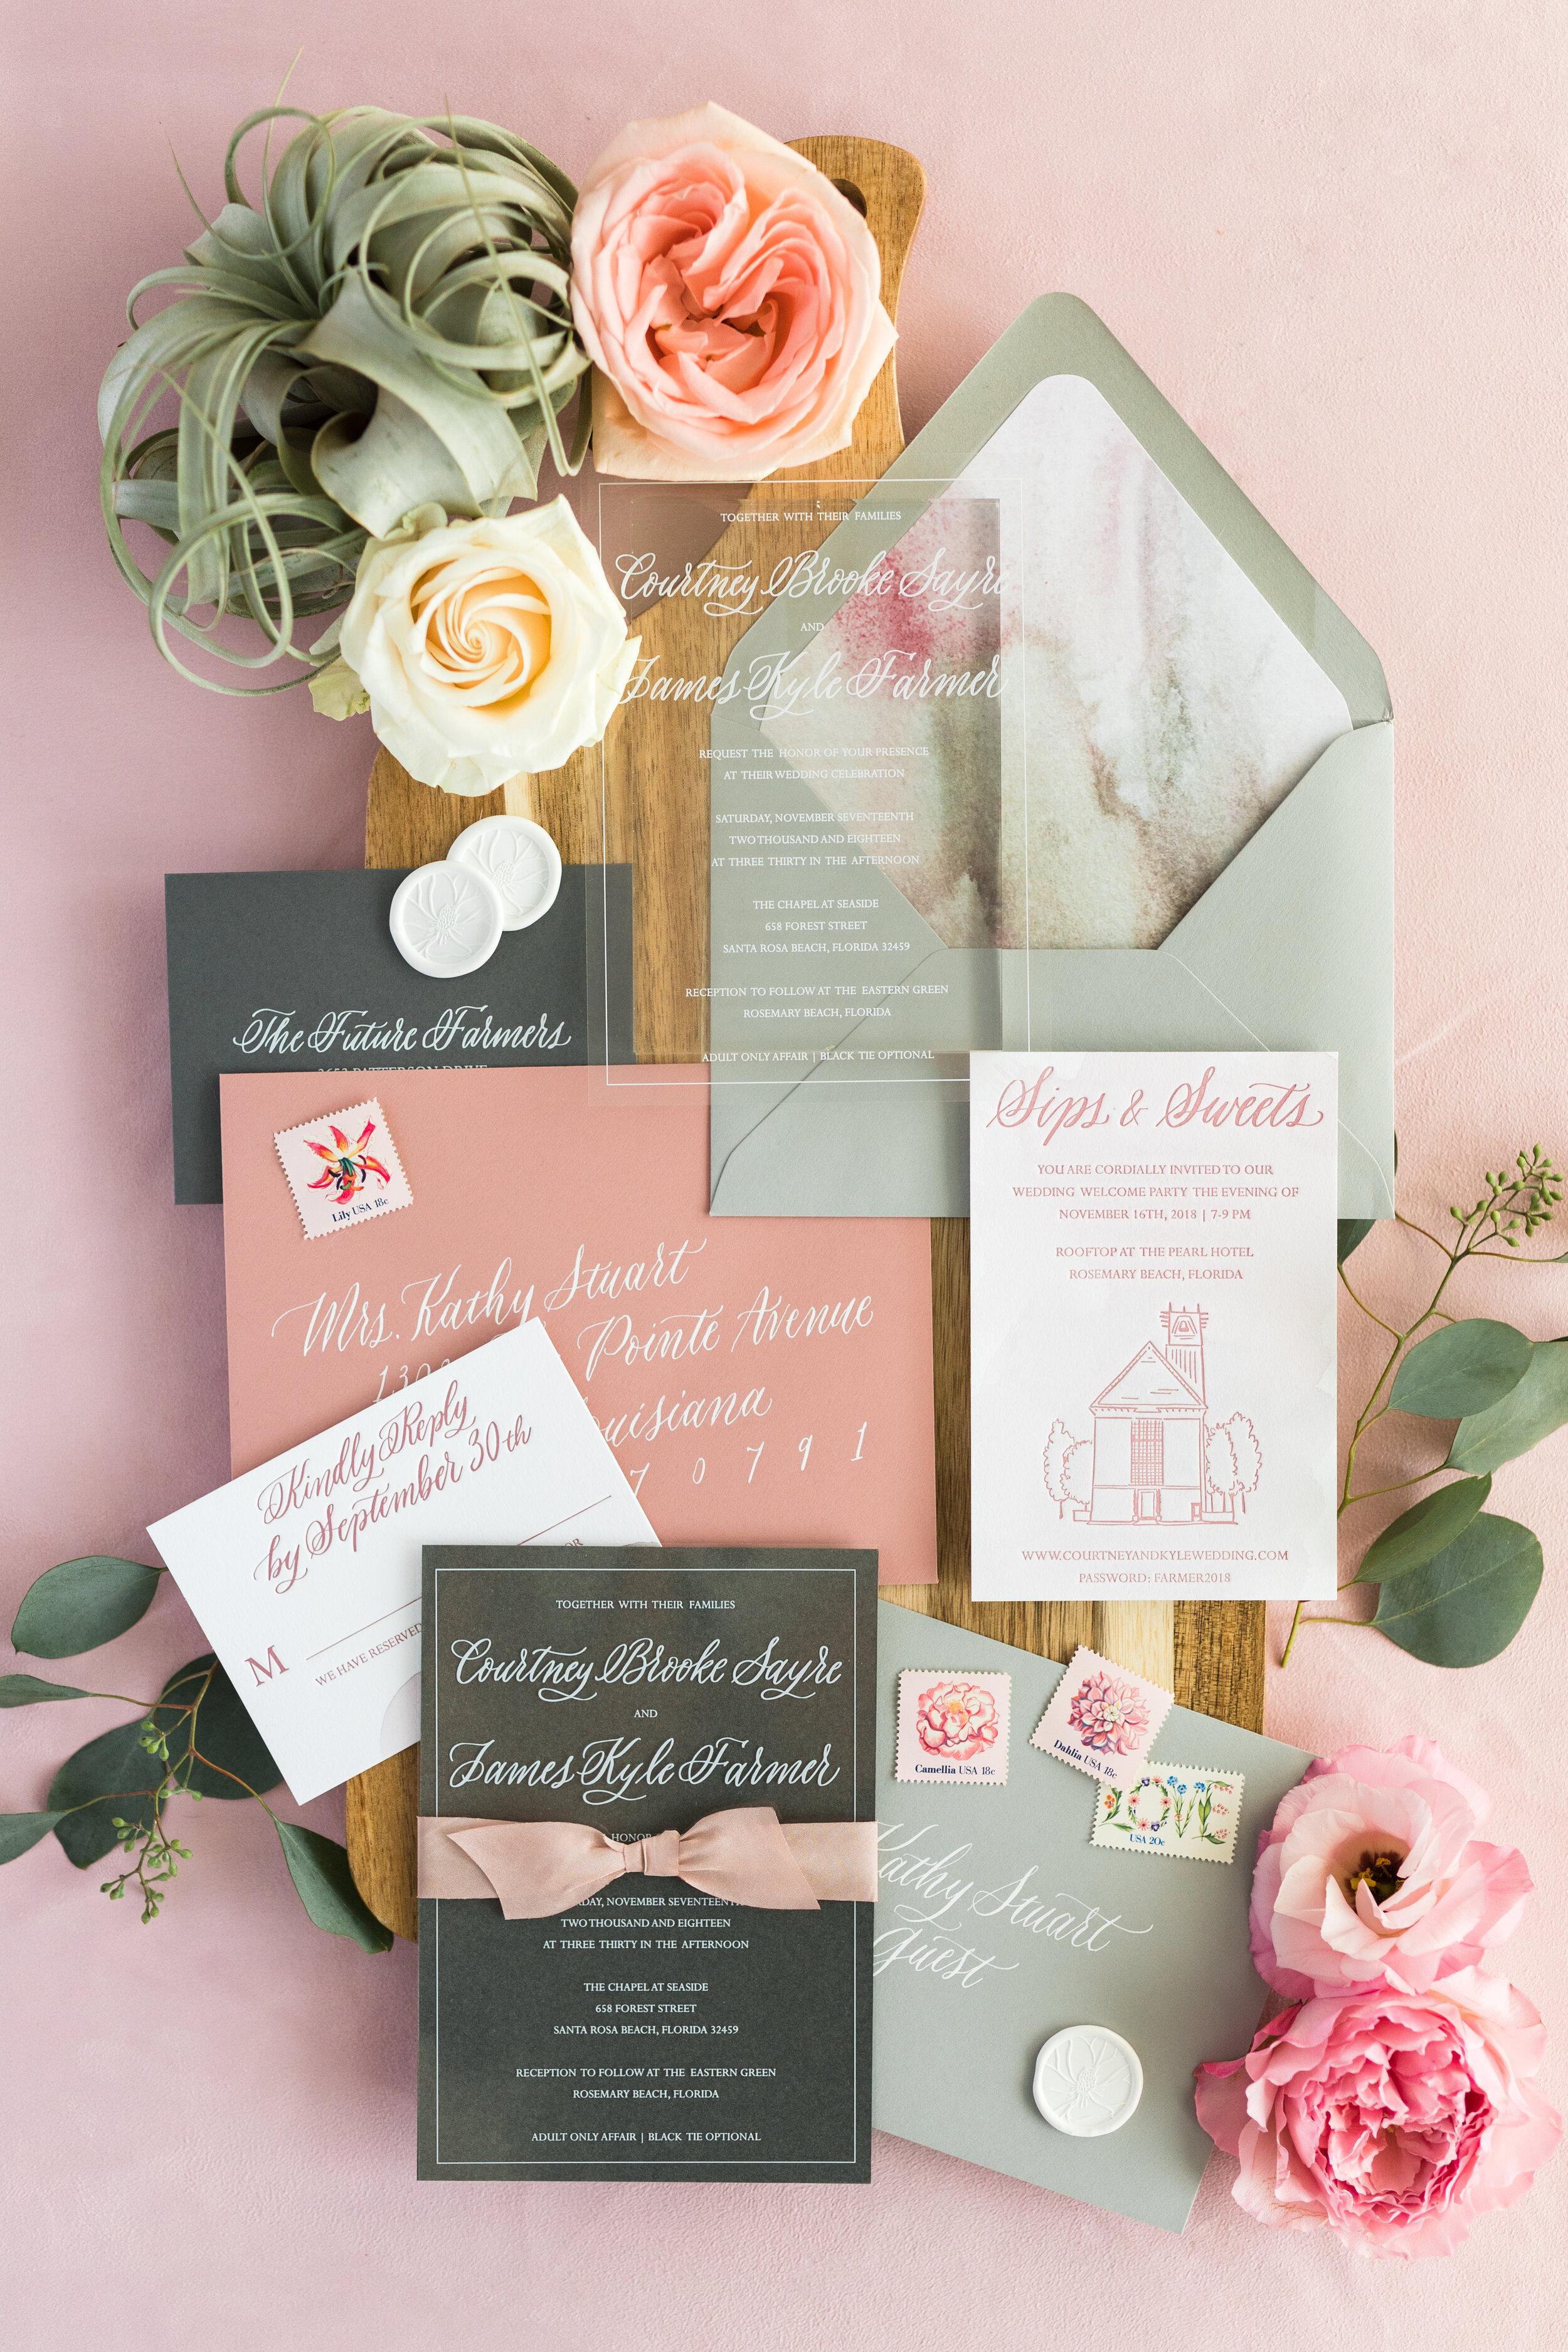 custom wedding invitations, atlanta stationery design, atlanta stationer, atlanta letterpress studio, atlanta calligrapher, calligraphy invitations